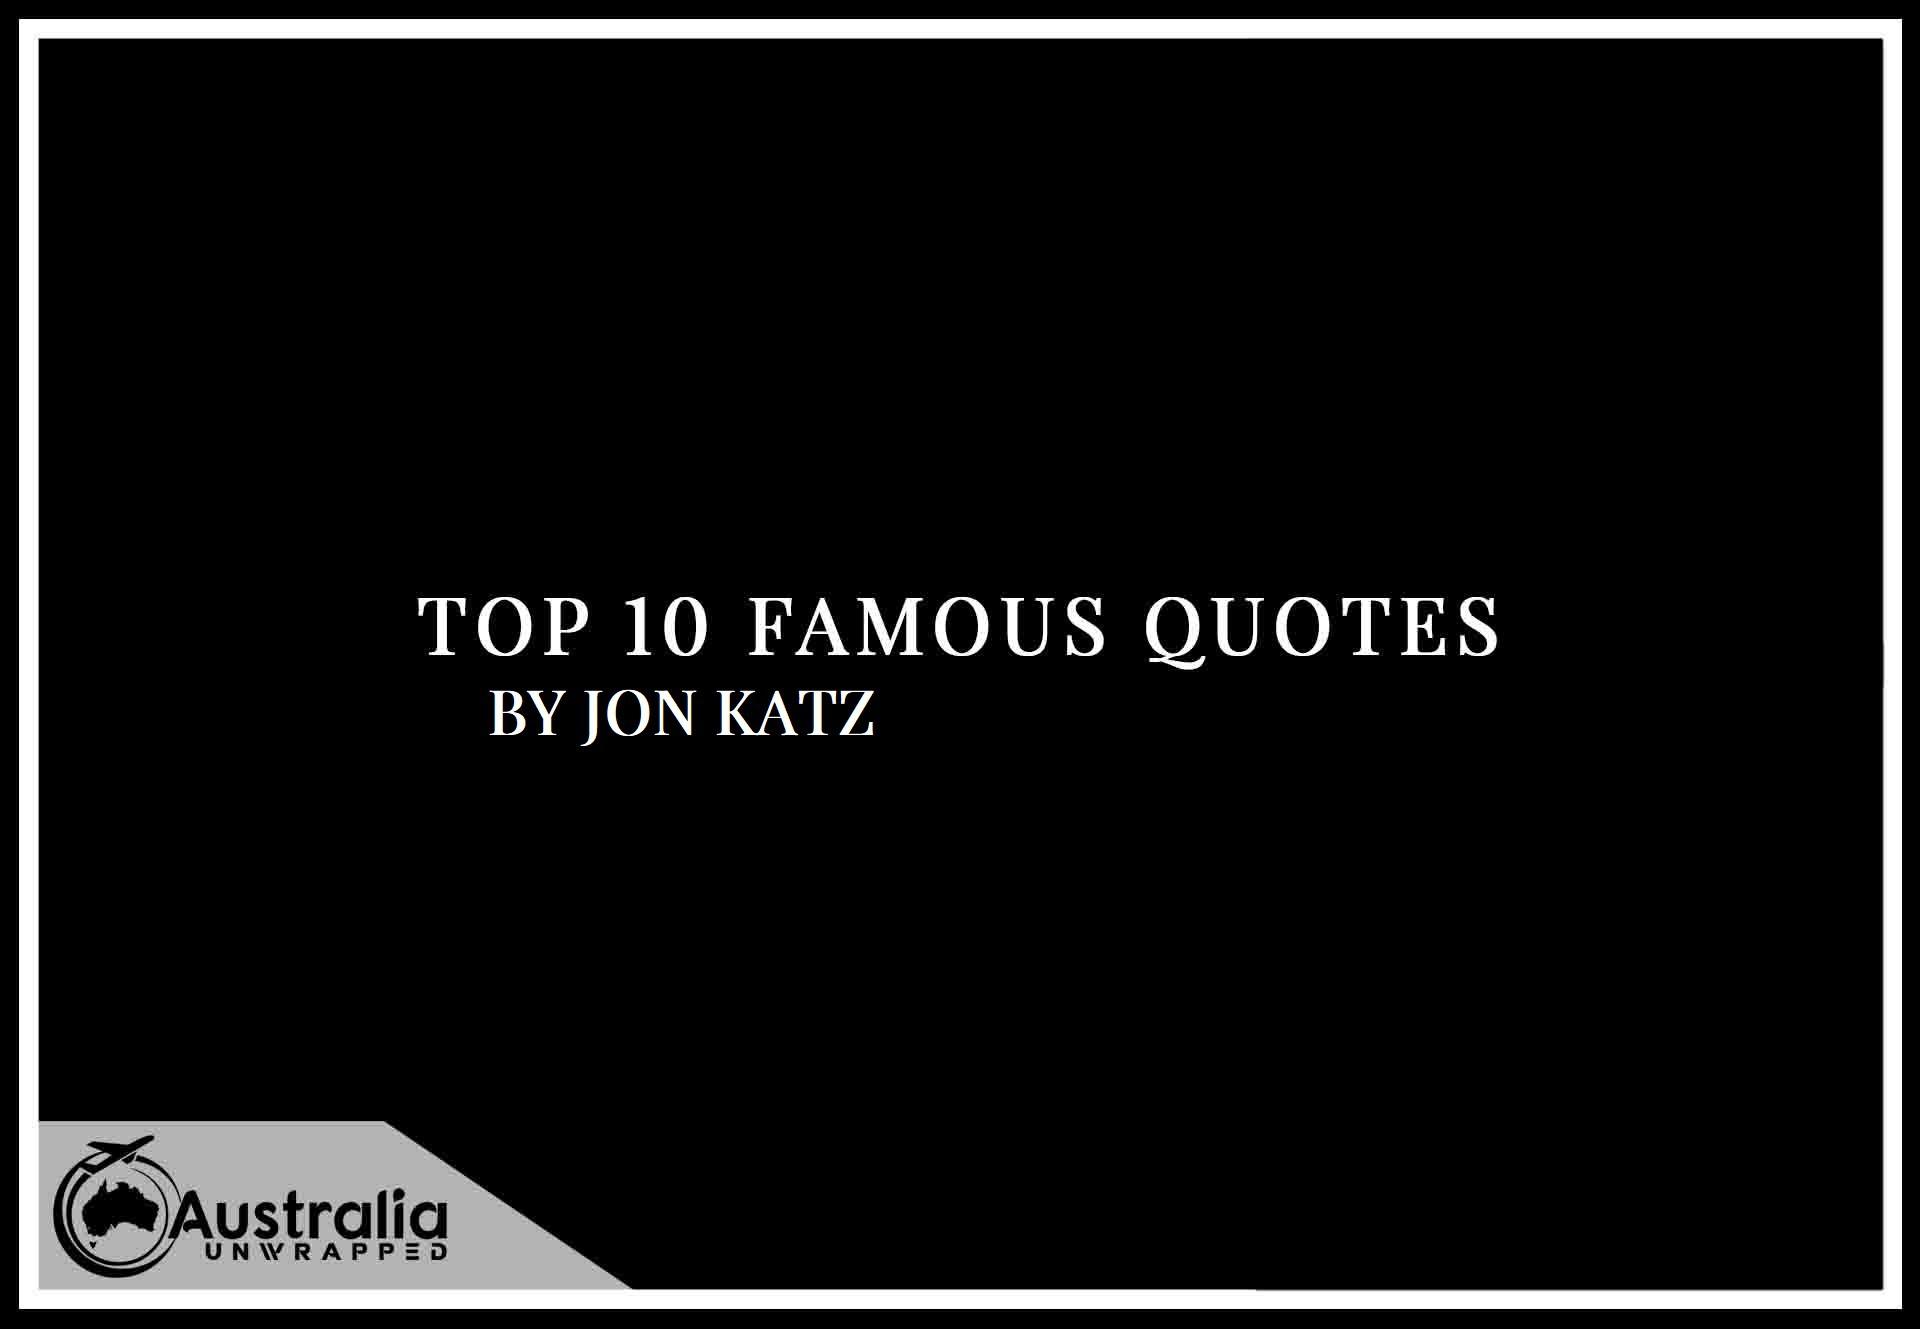 Top 10 Famous Quotes by Author Jon Katz